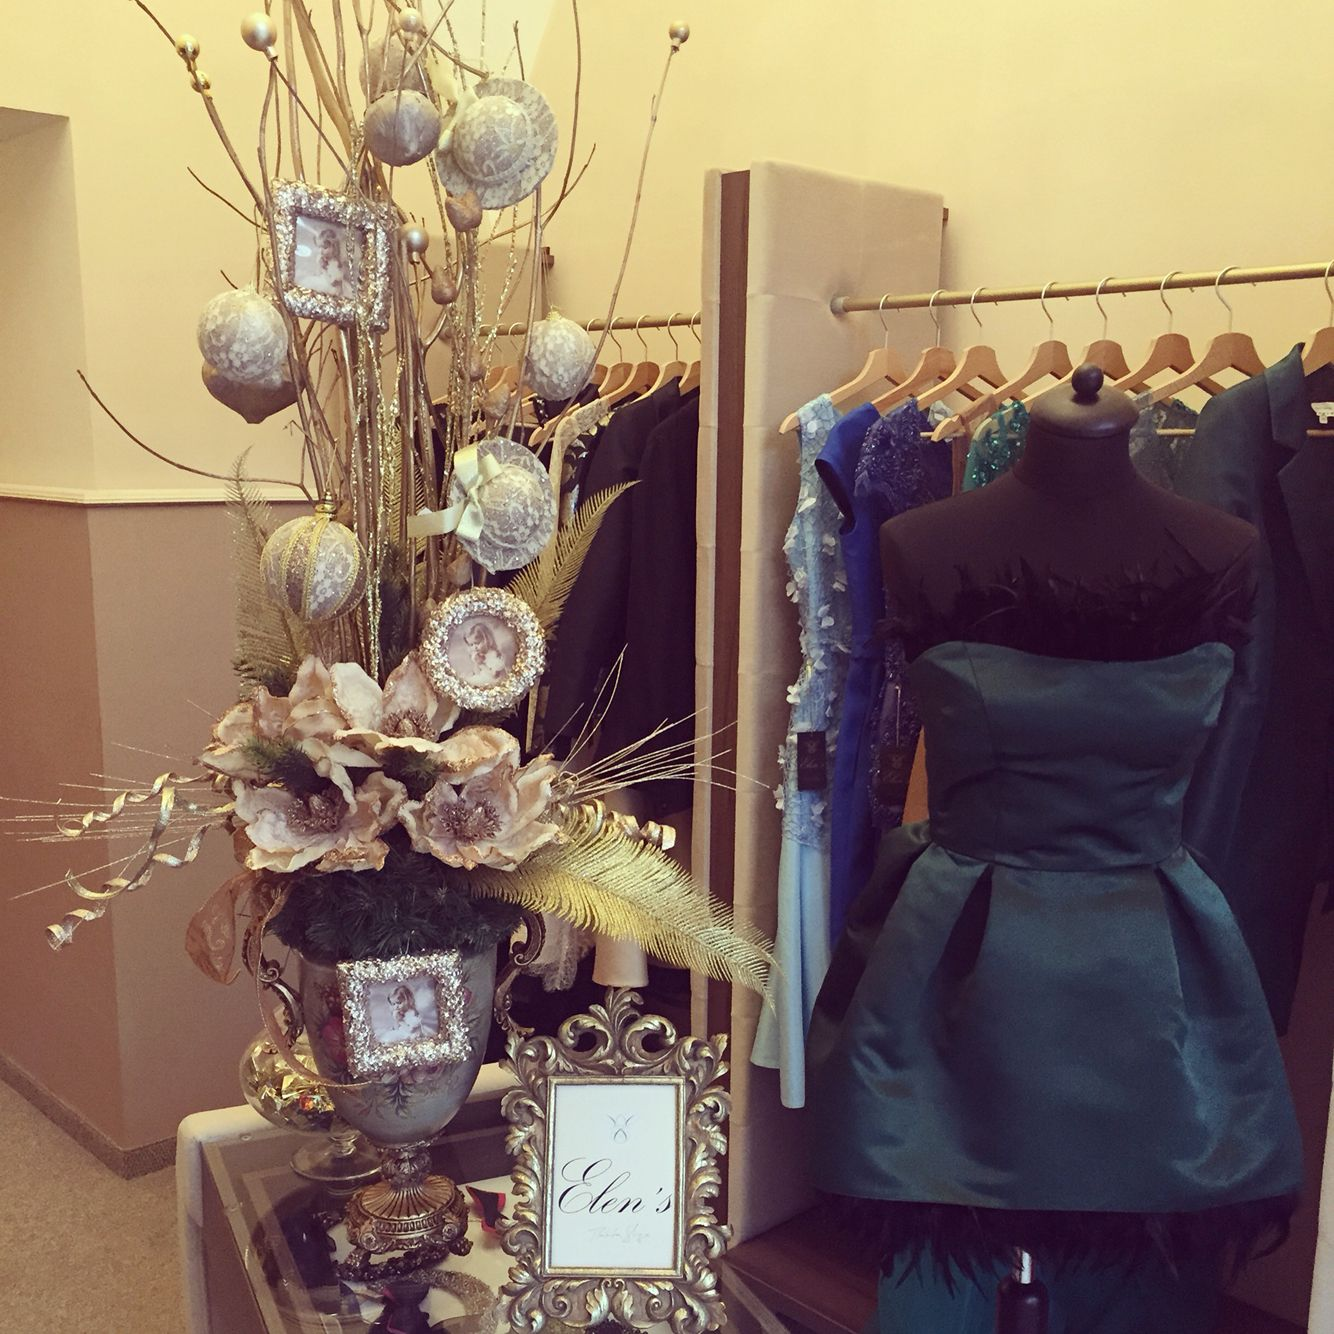 Christmas spirit in Elen'showroom